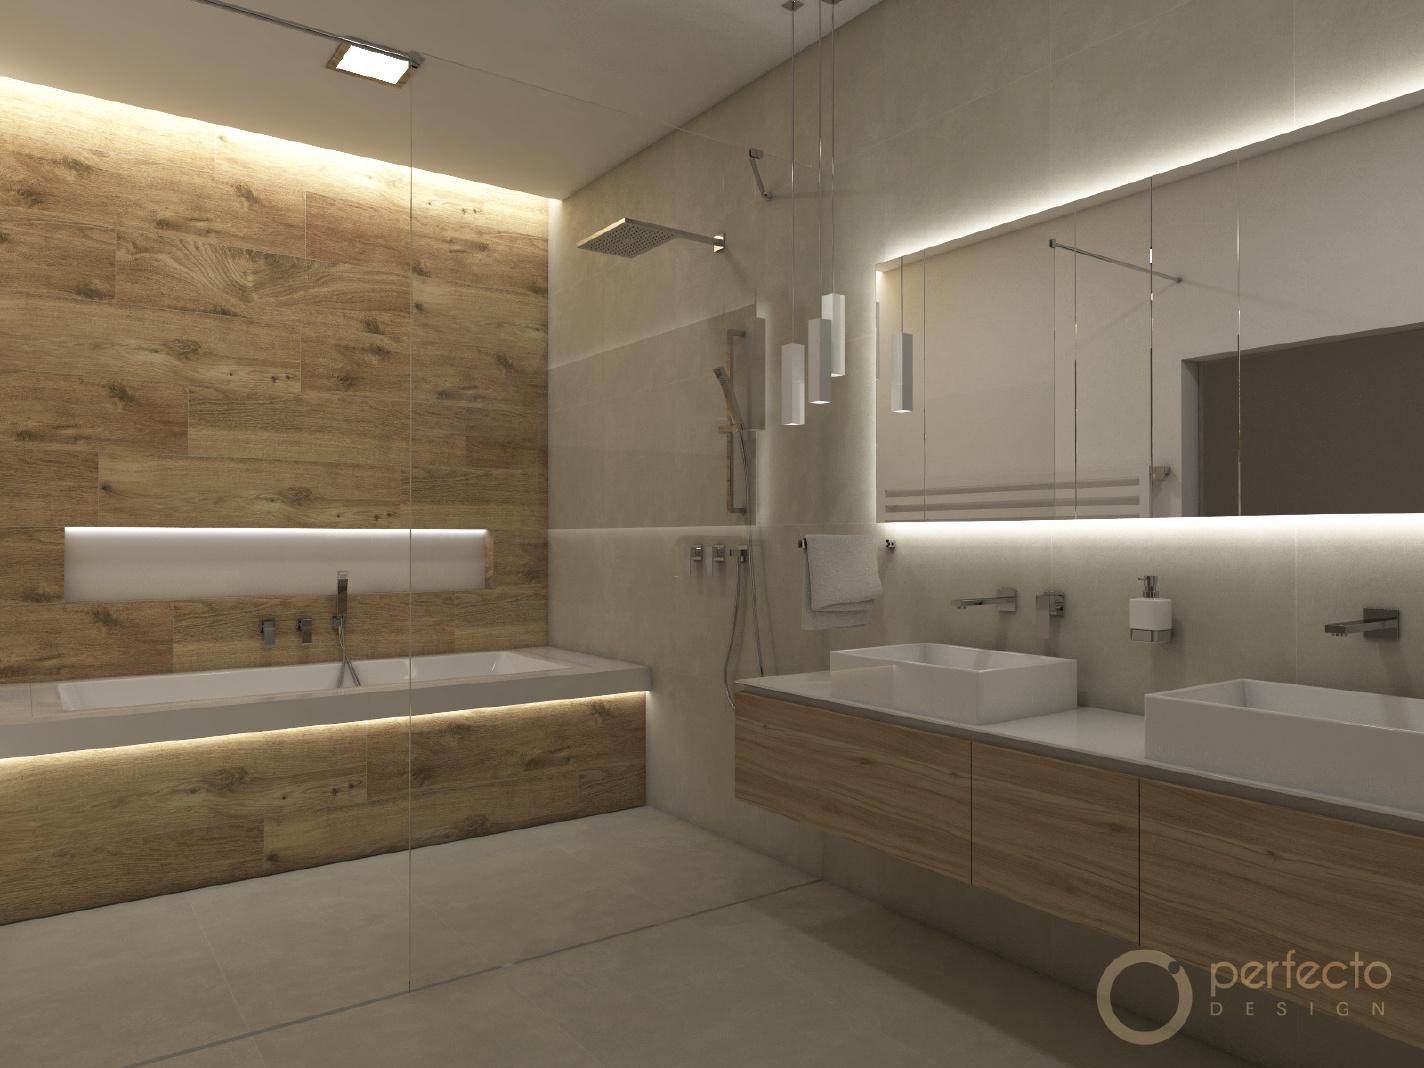 Modernes Badezimmer SAND | Perfecto design